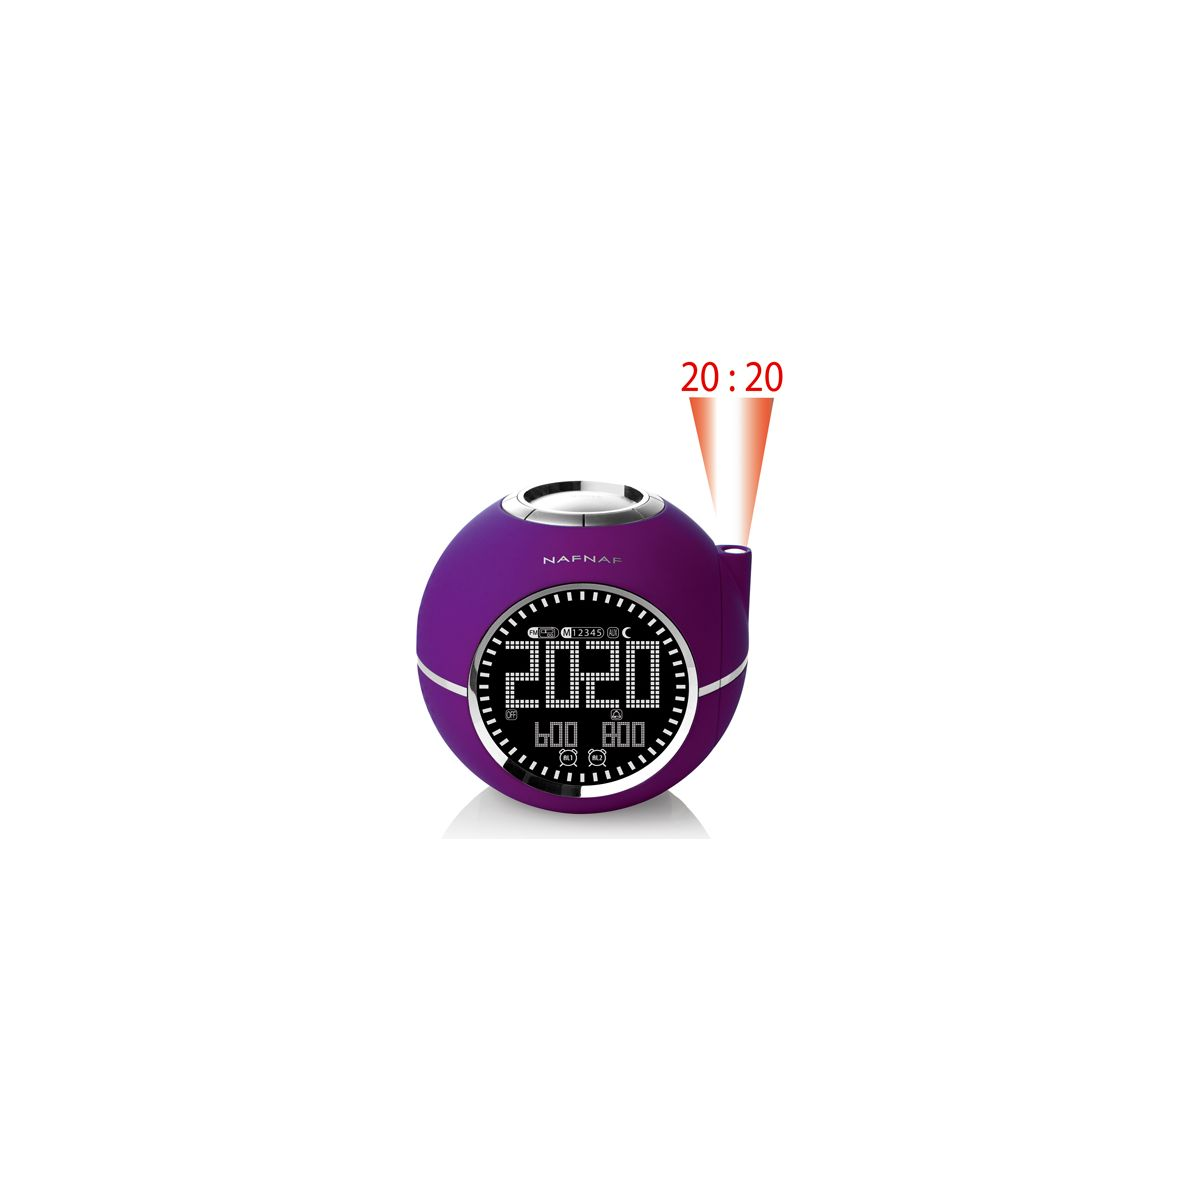 Radio-réveil nafnaf clockine prune - 7% de remise immédiate avec le code : multi7 (photo)